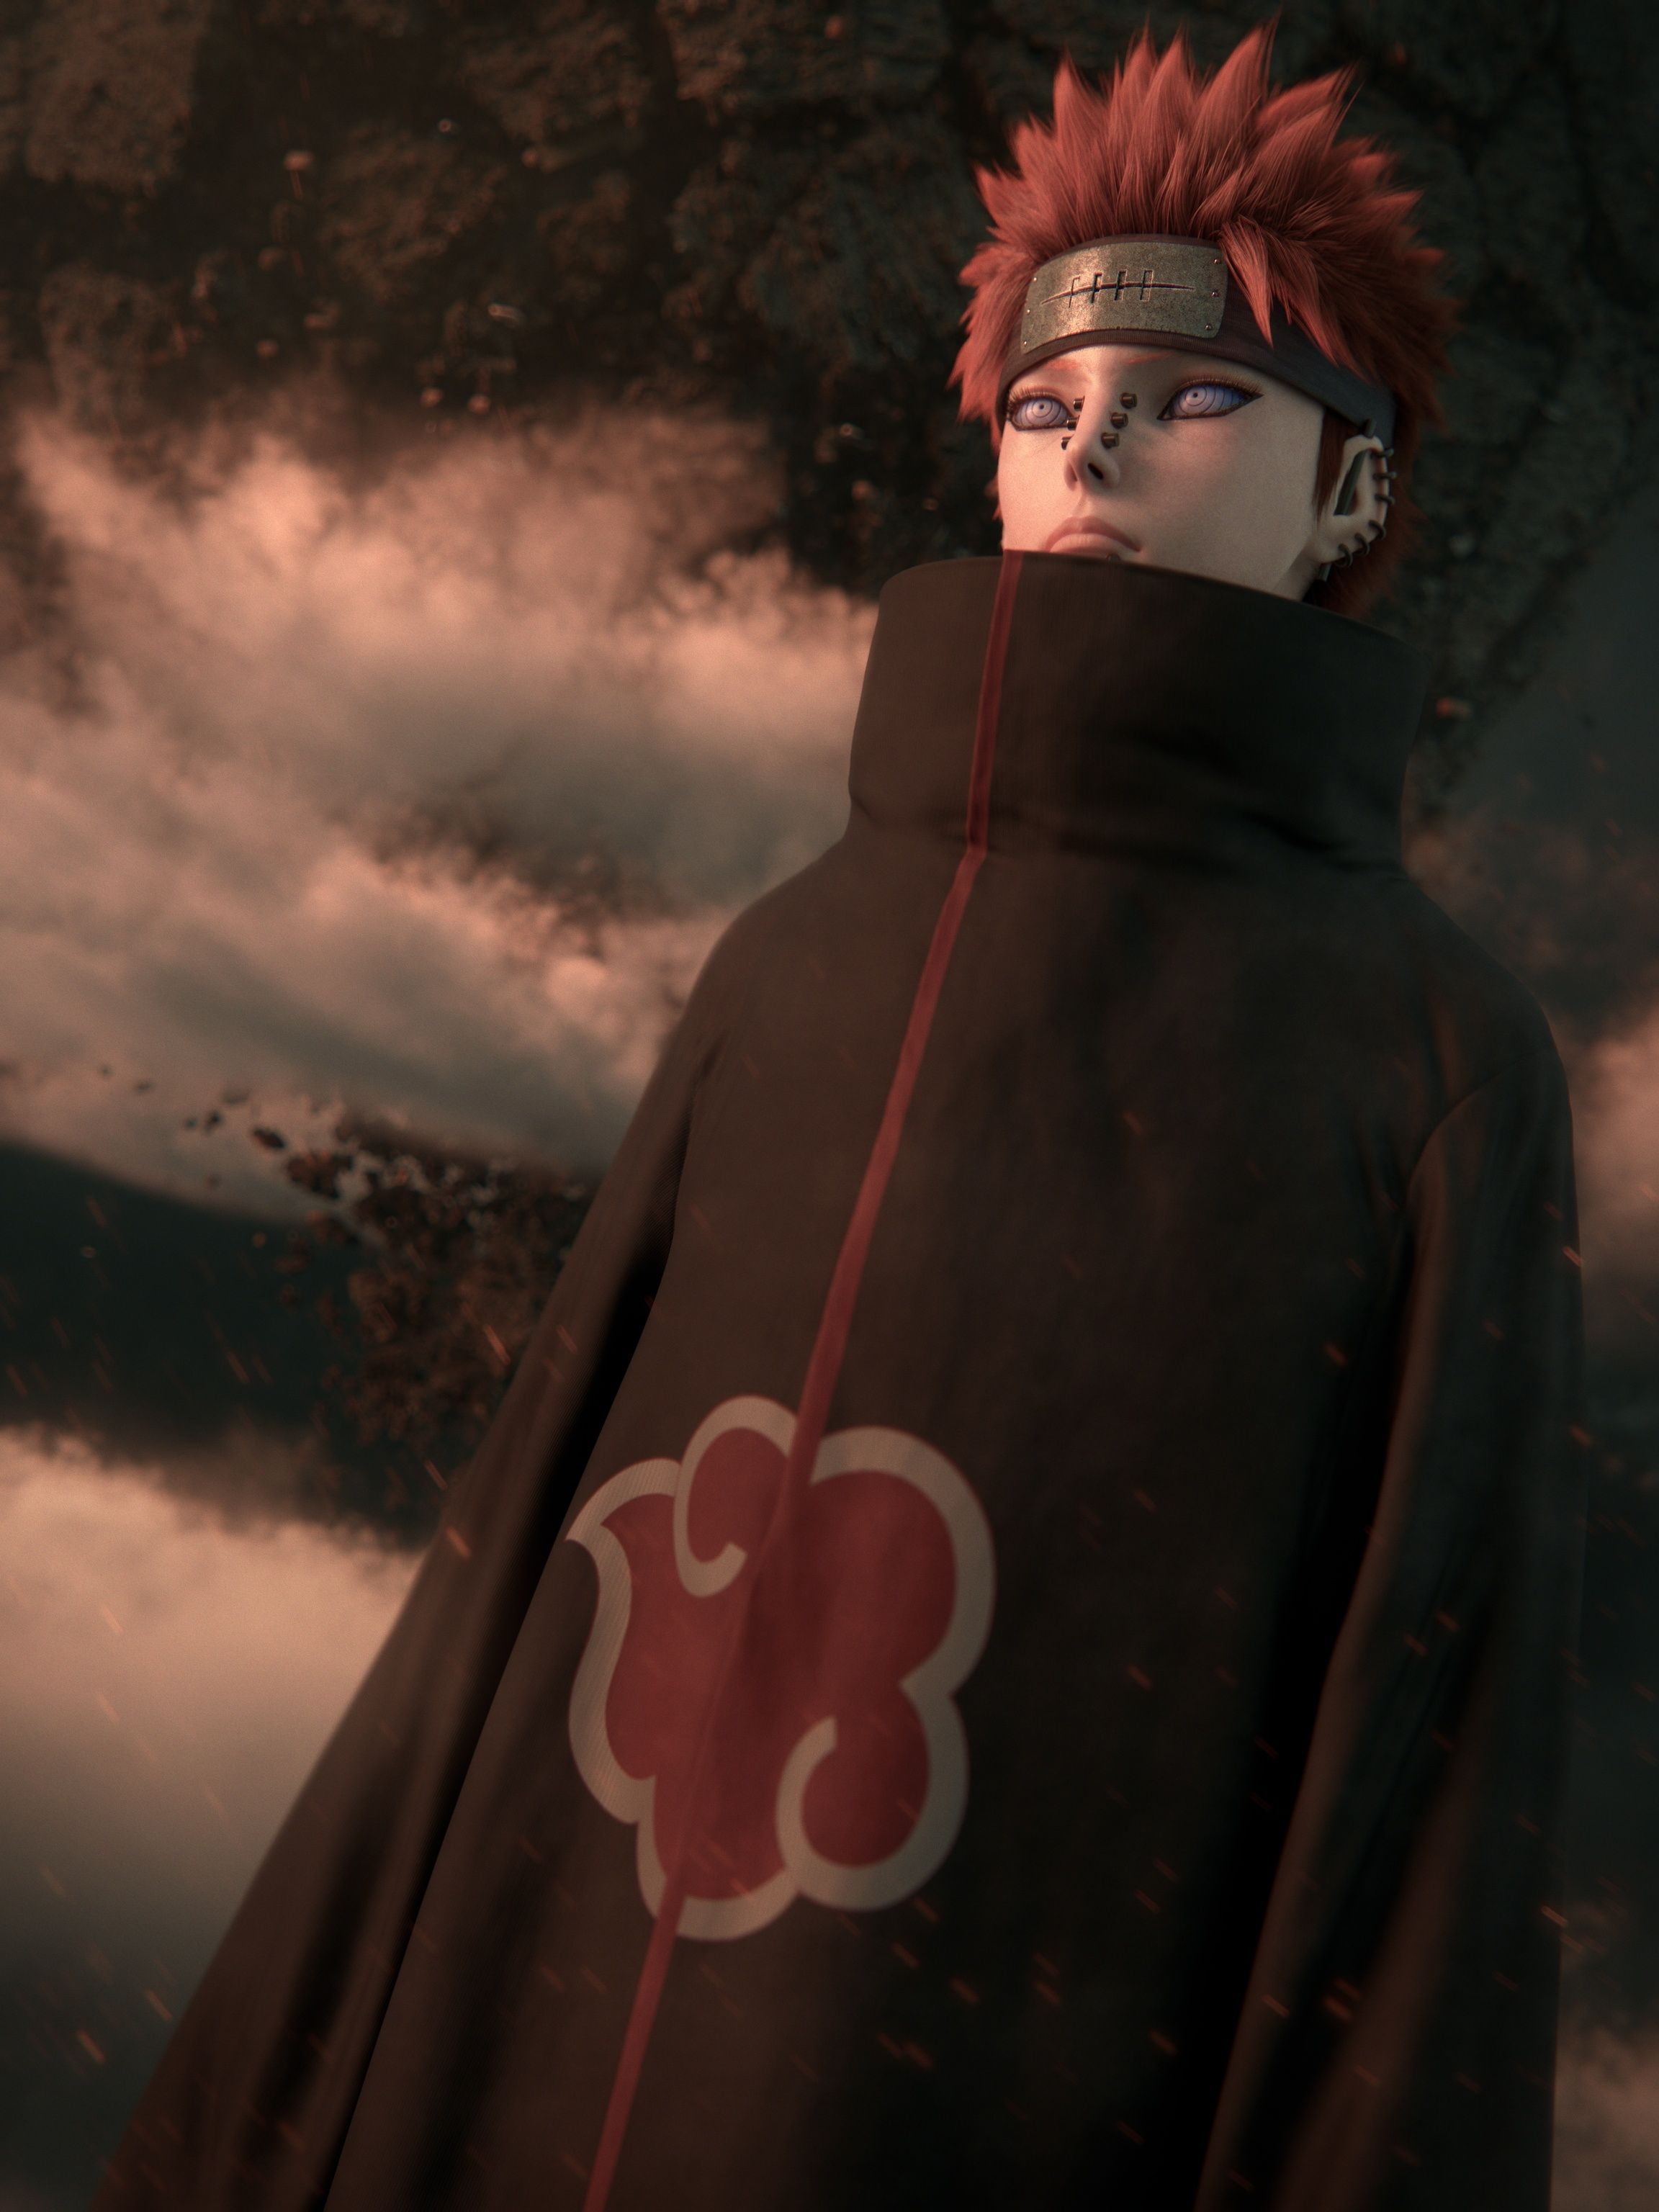 Pin de kaleb barbrey em Best villians in Naruto Anime